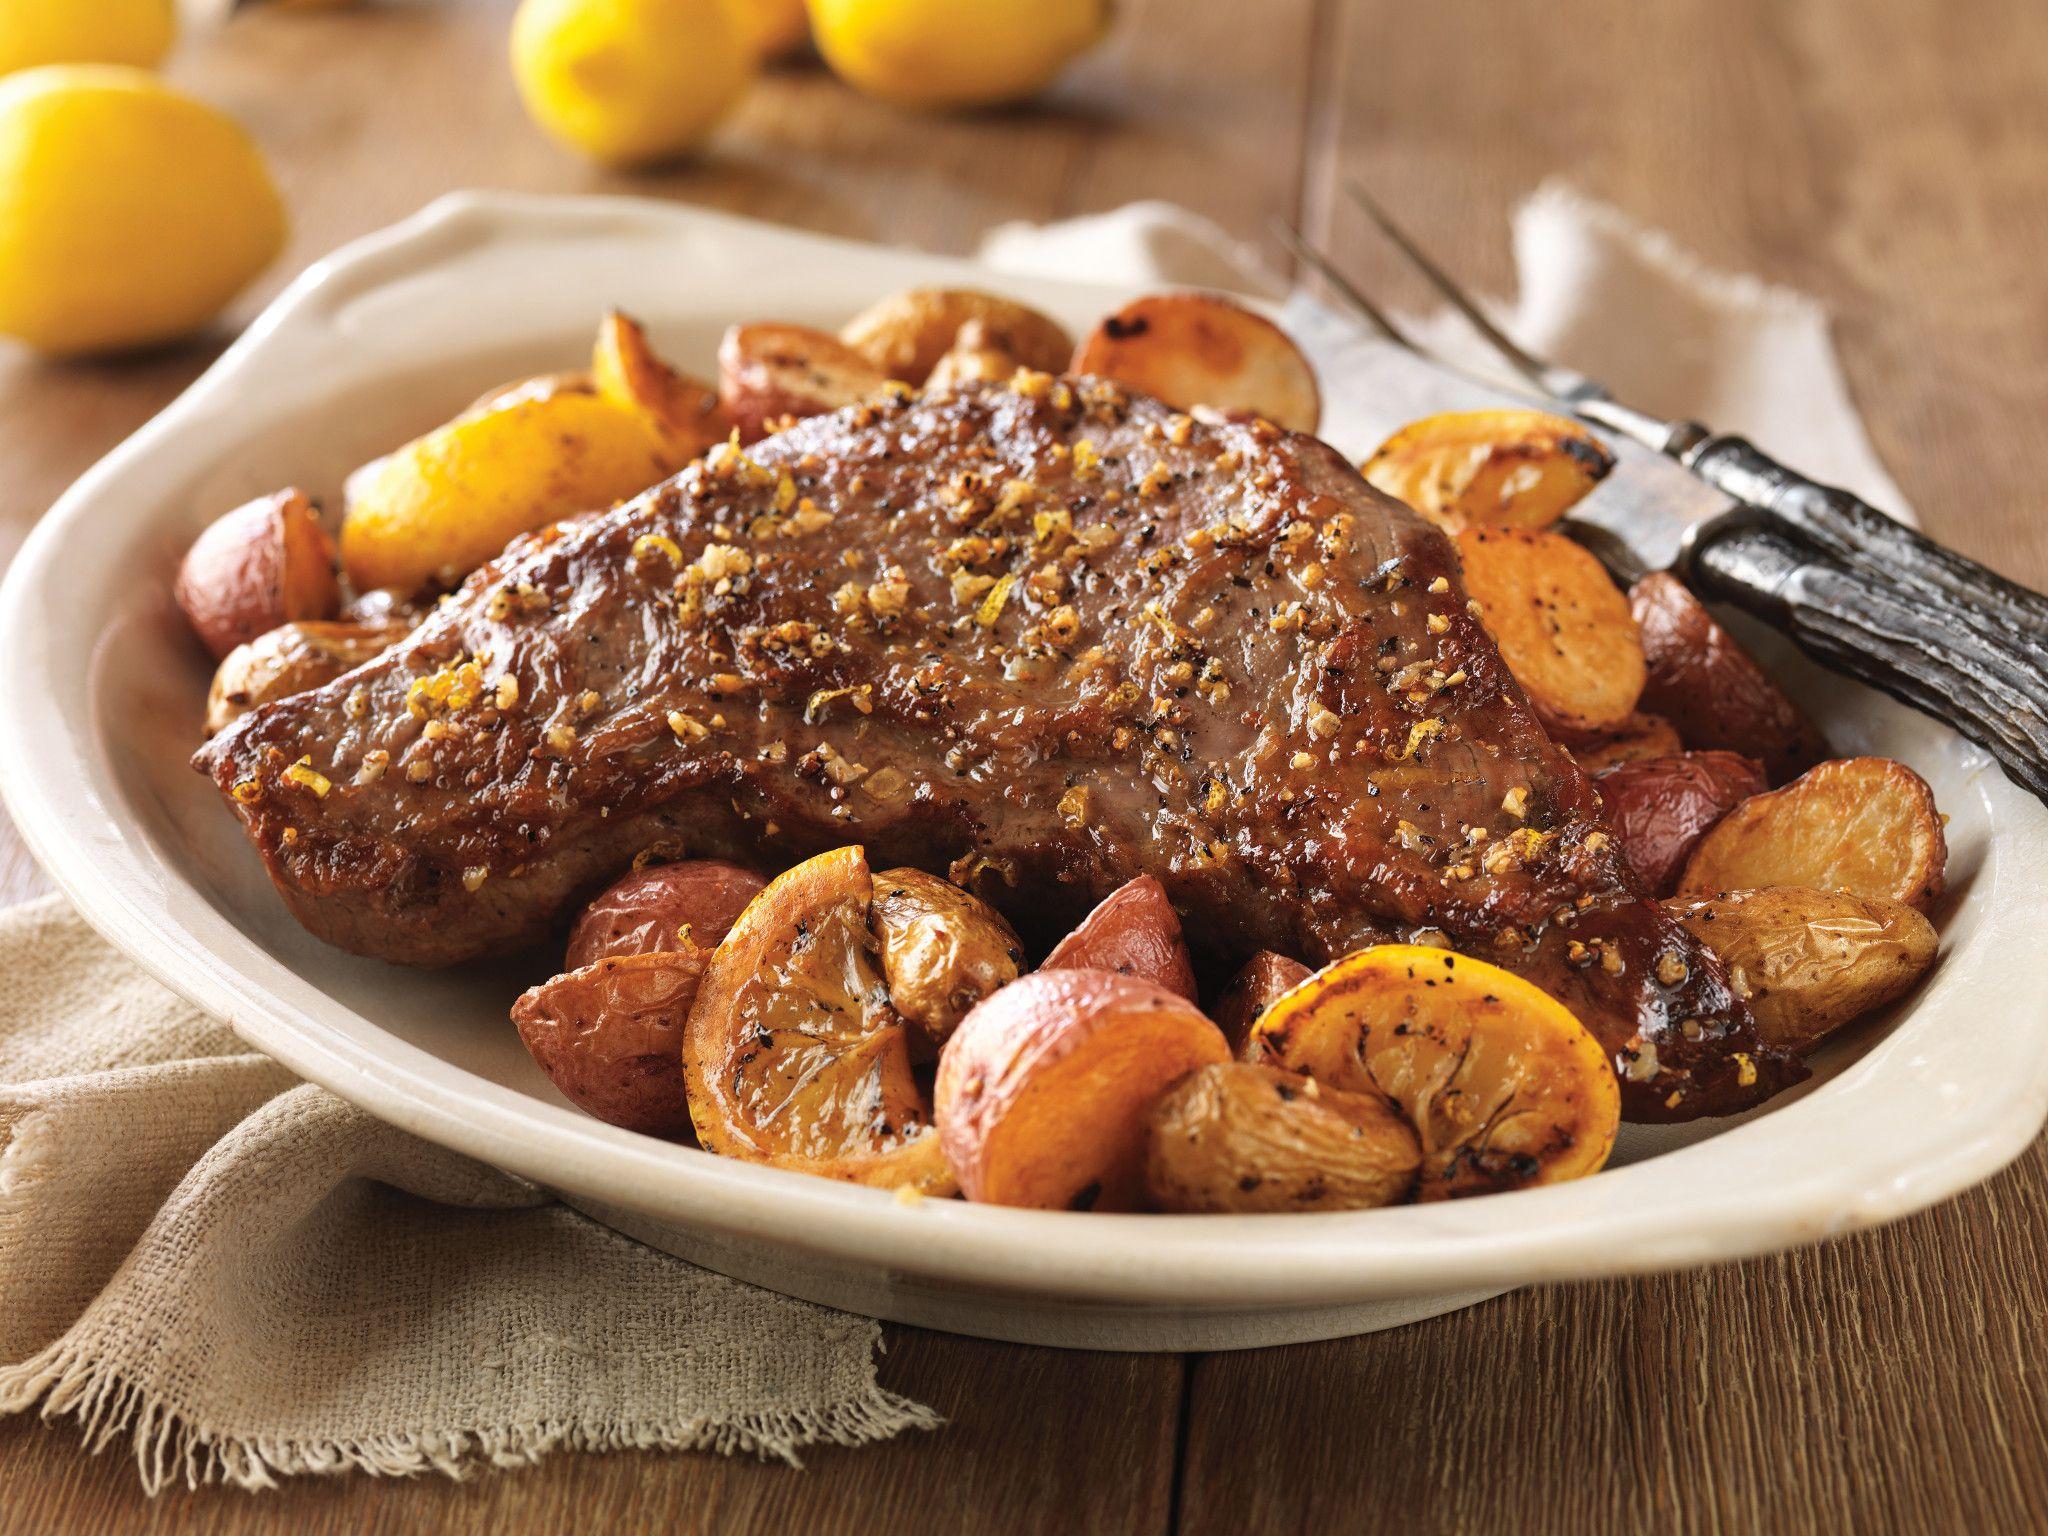 Lemon Garlic Beef Tri Tip And Roasted Potatoes,Flat Iron Steak Cooked